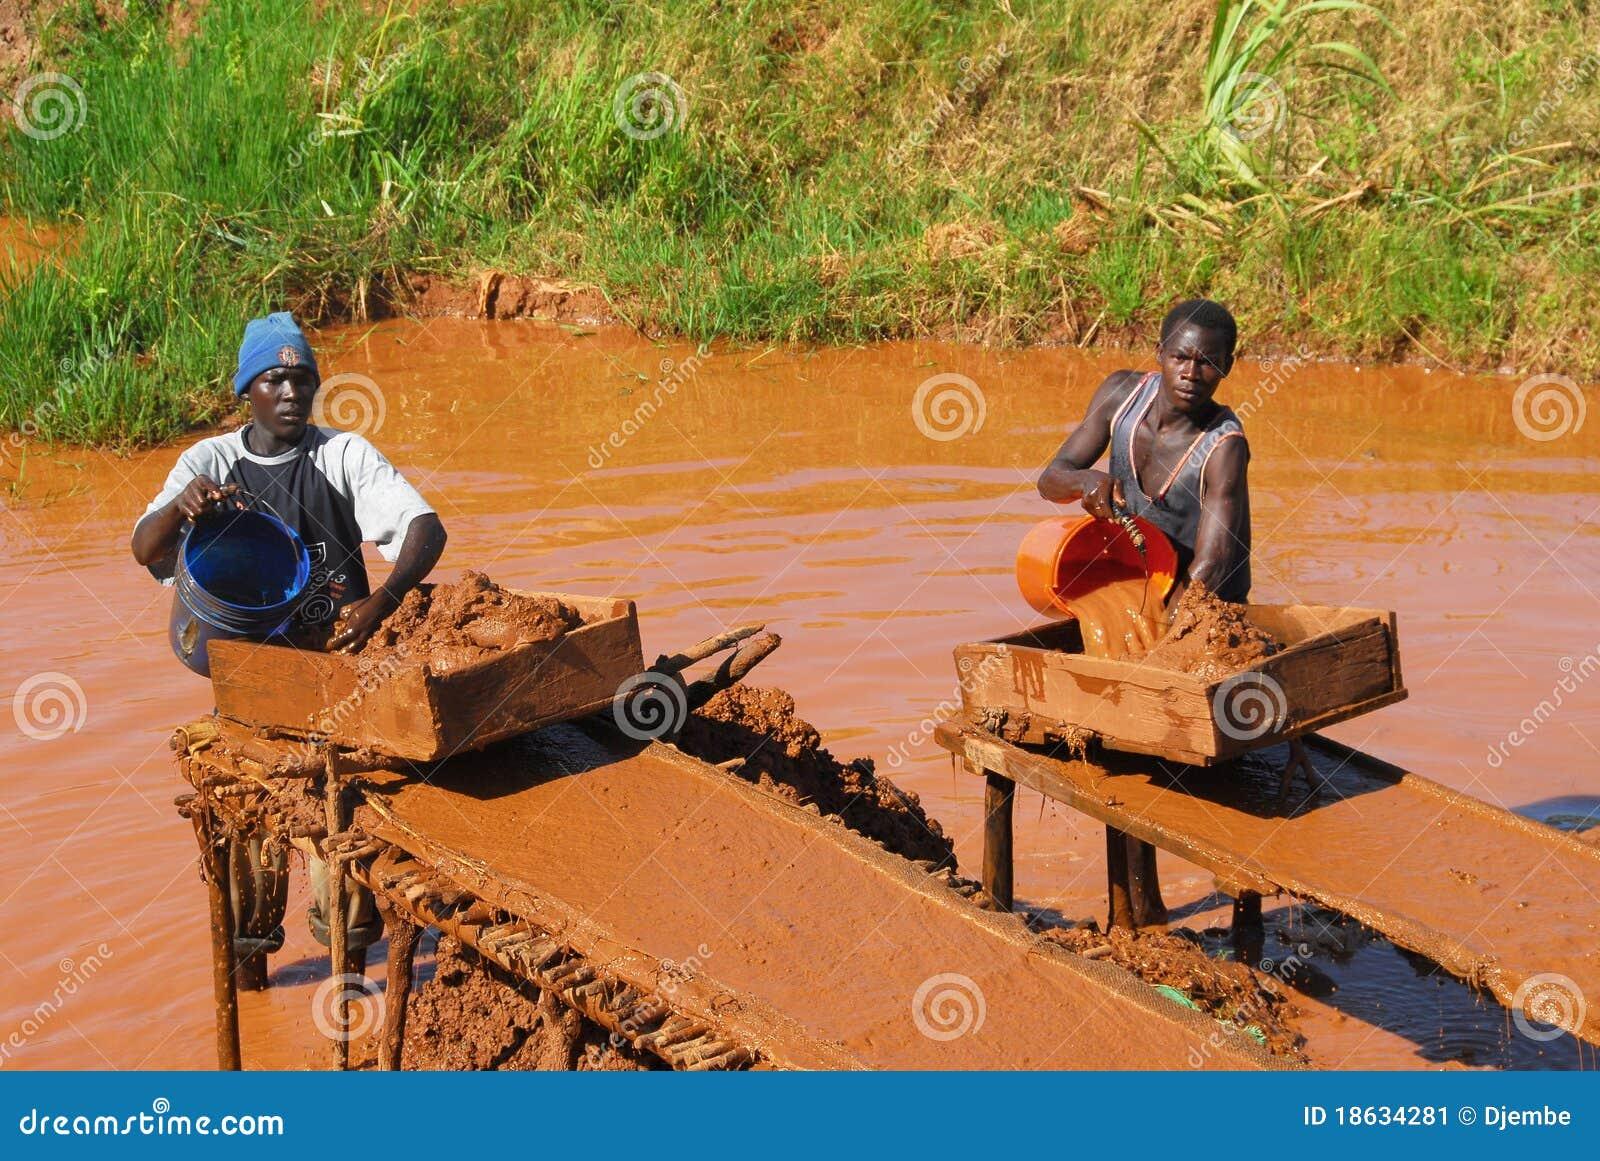 Africa gruvarbetare